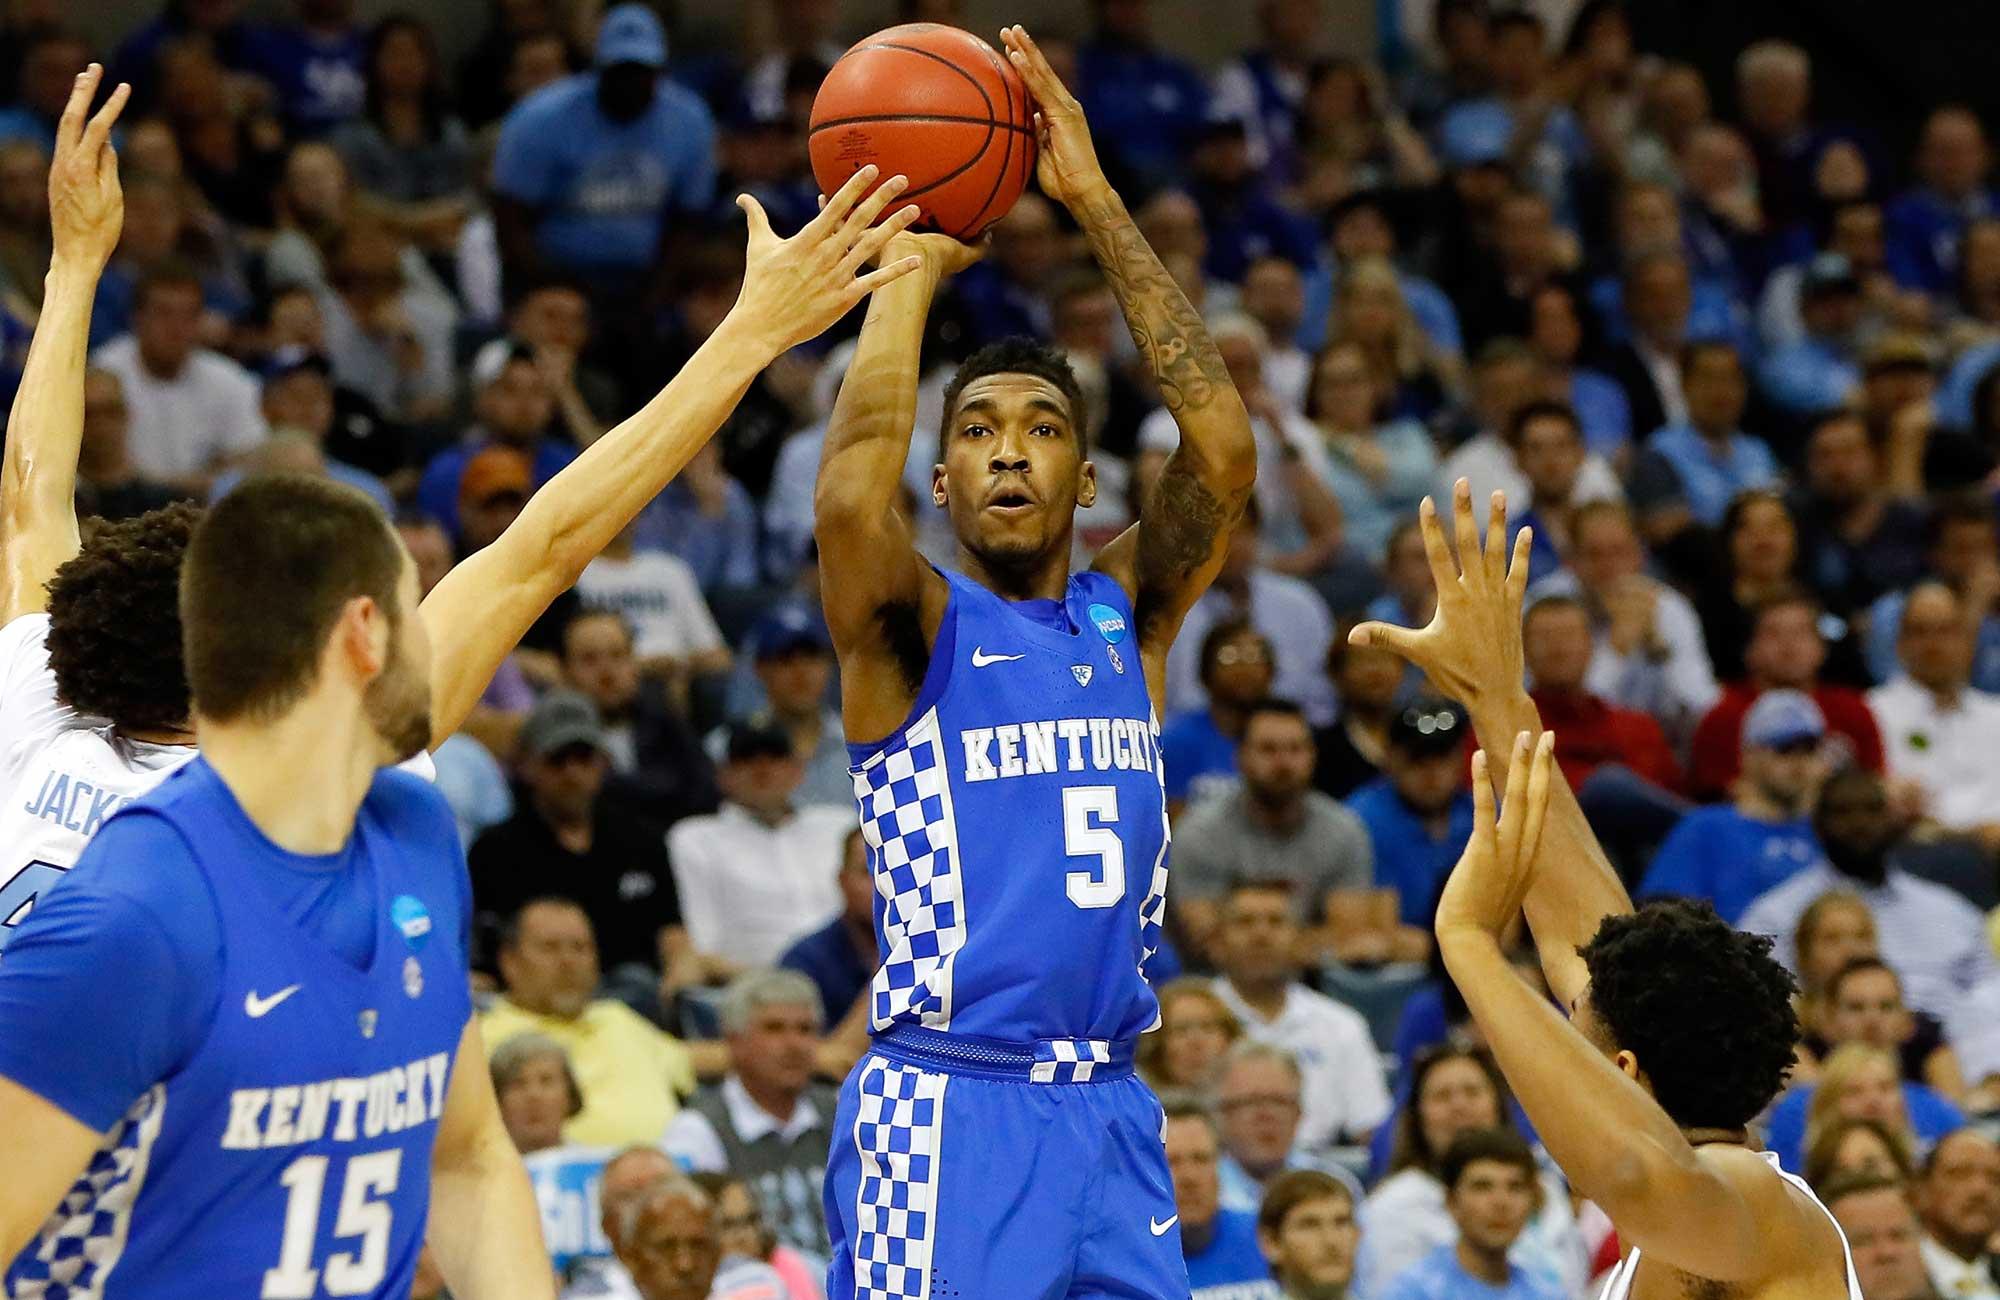 Uk Basketball: 2017 NBA Draft Superlatives: Biggest Sleepers, Risks And